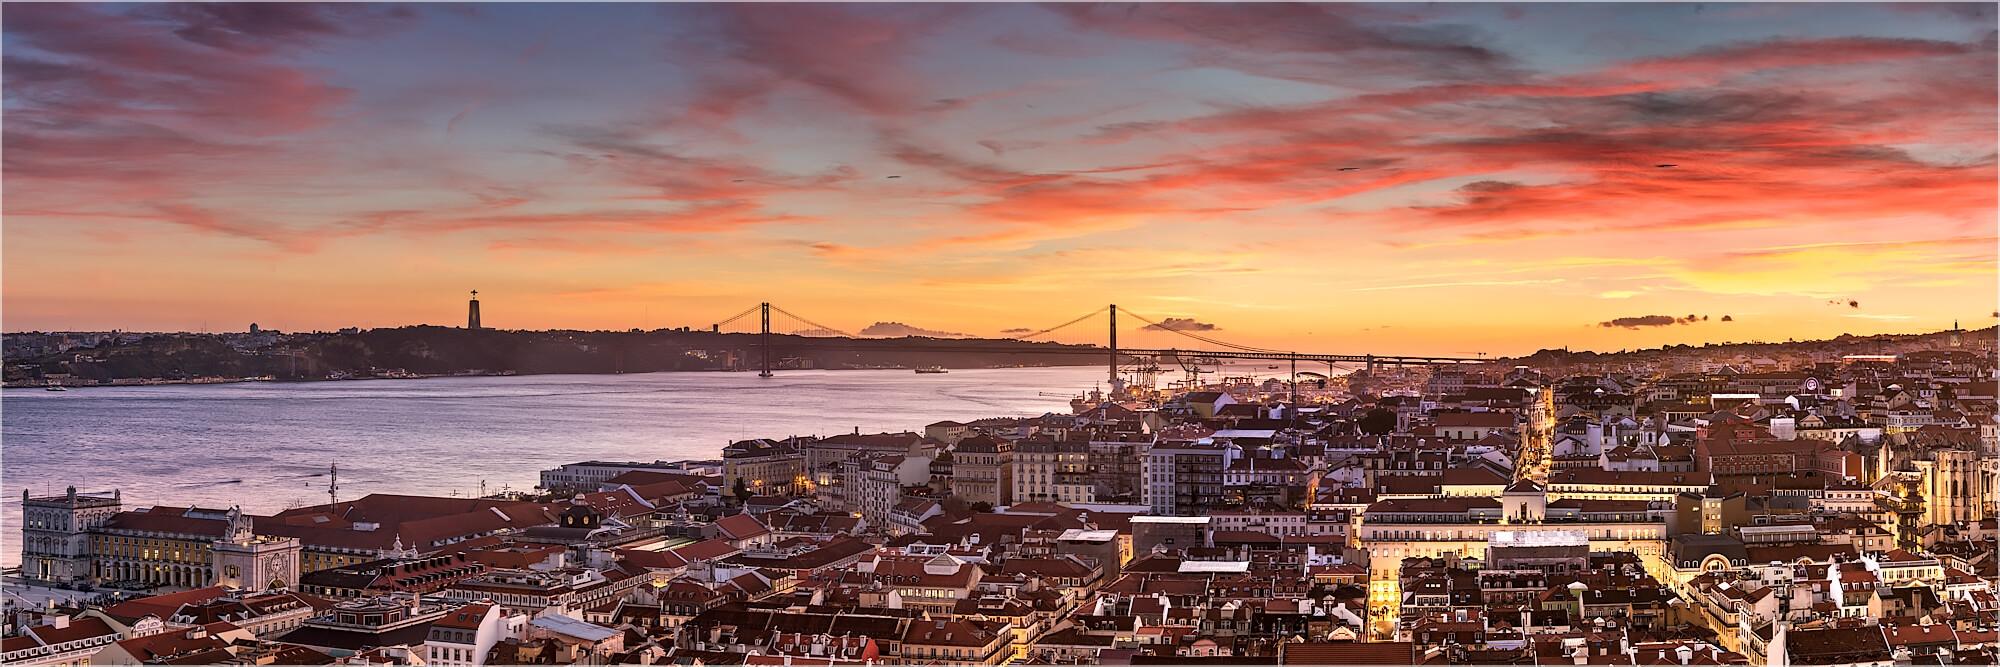 Panoramabild Lissabon im Sonnenuntergang